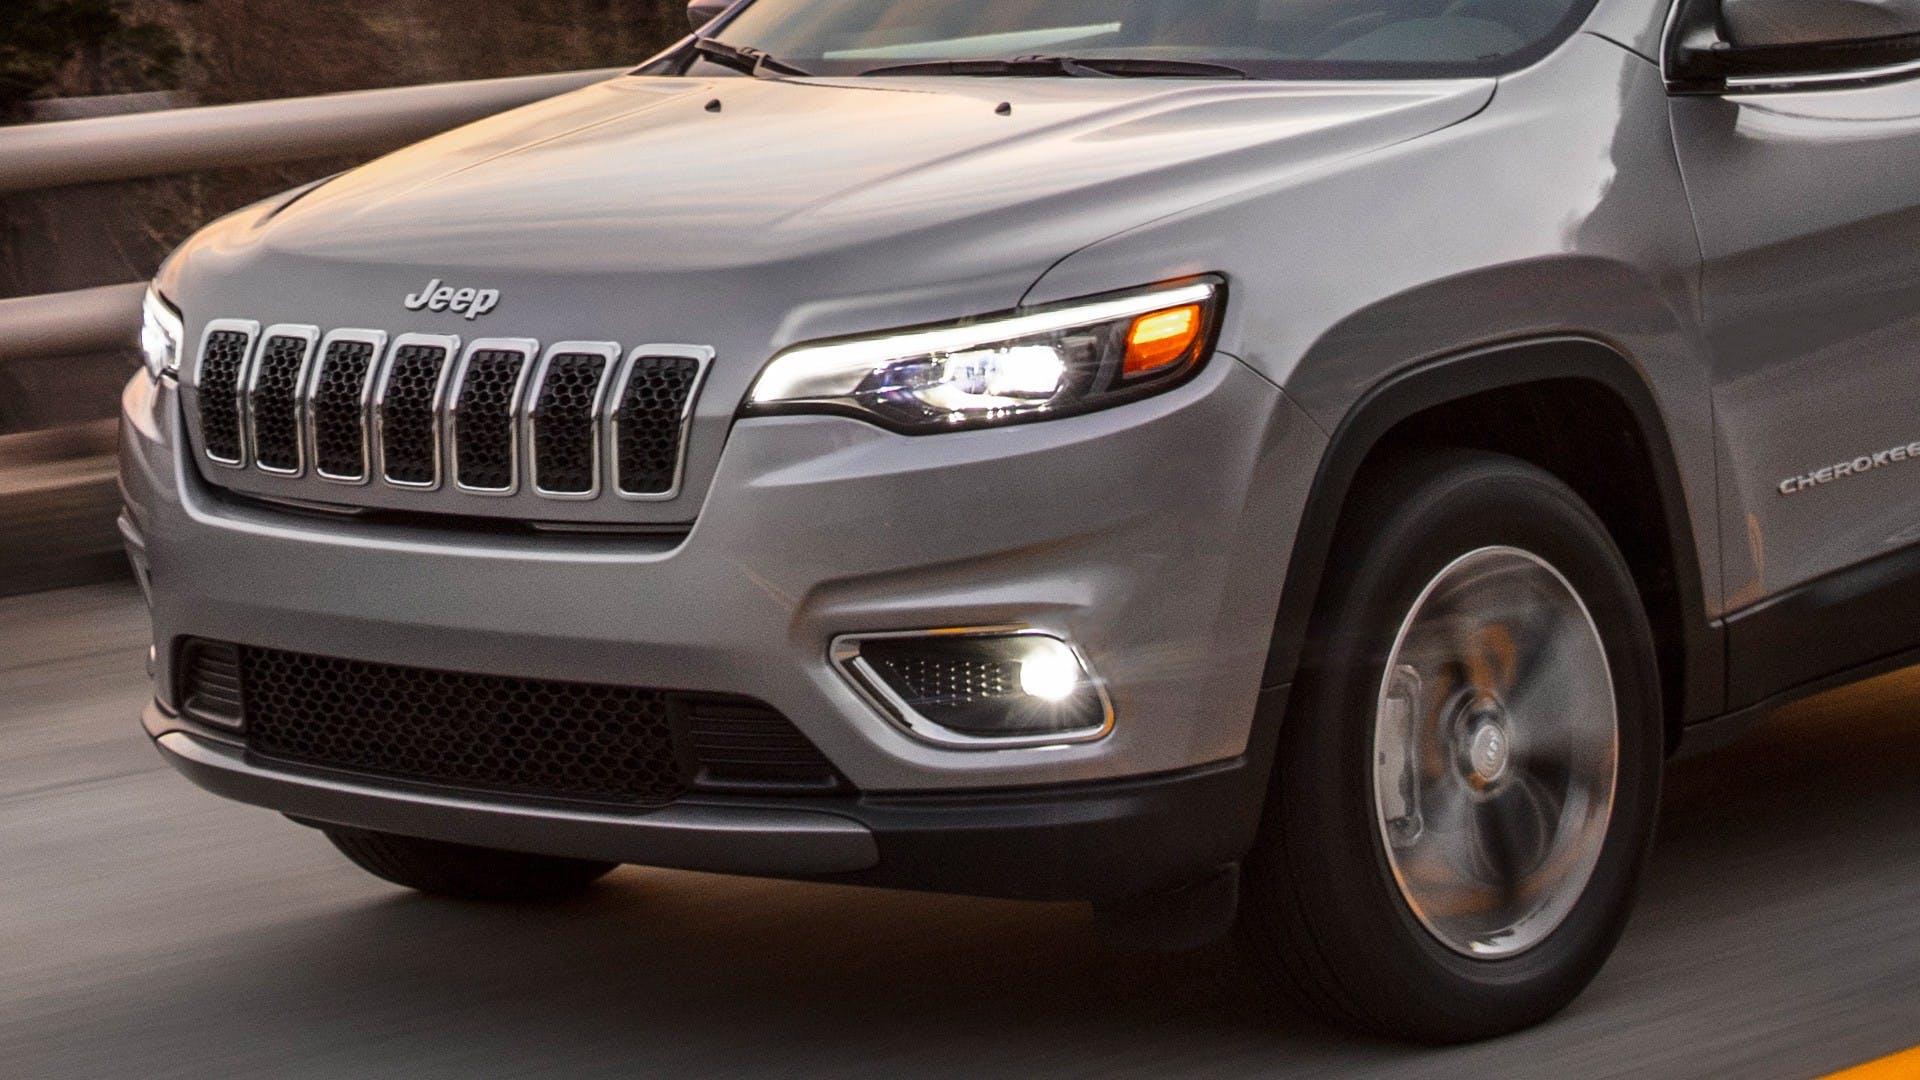 Jeep Cherokee 2018 frontale grigia